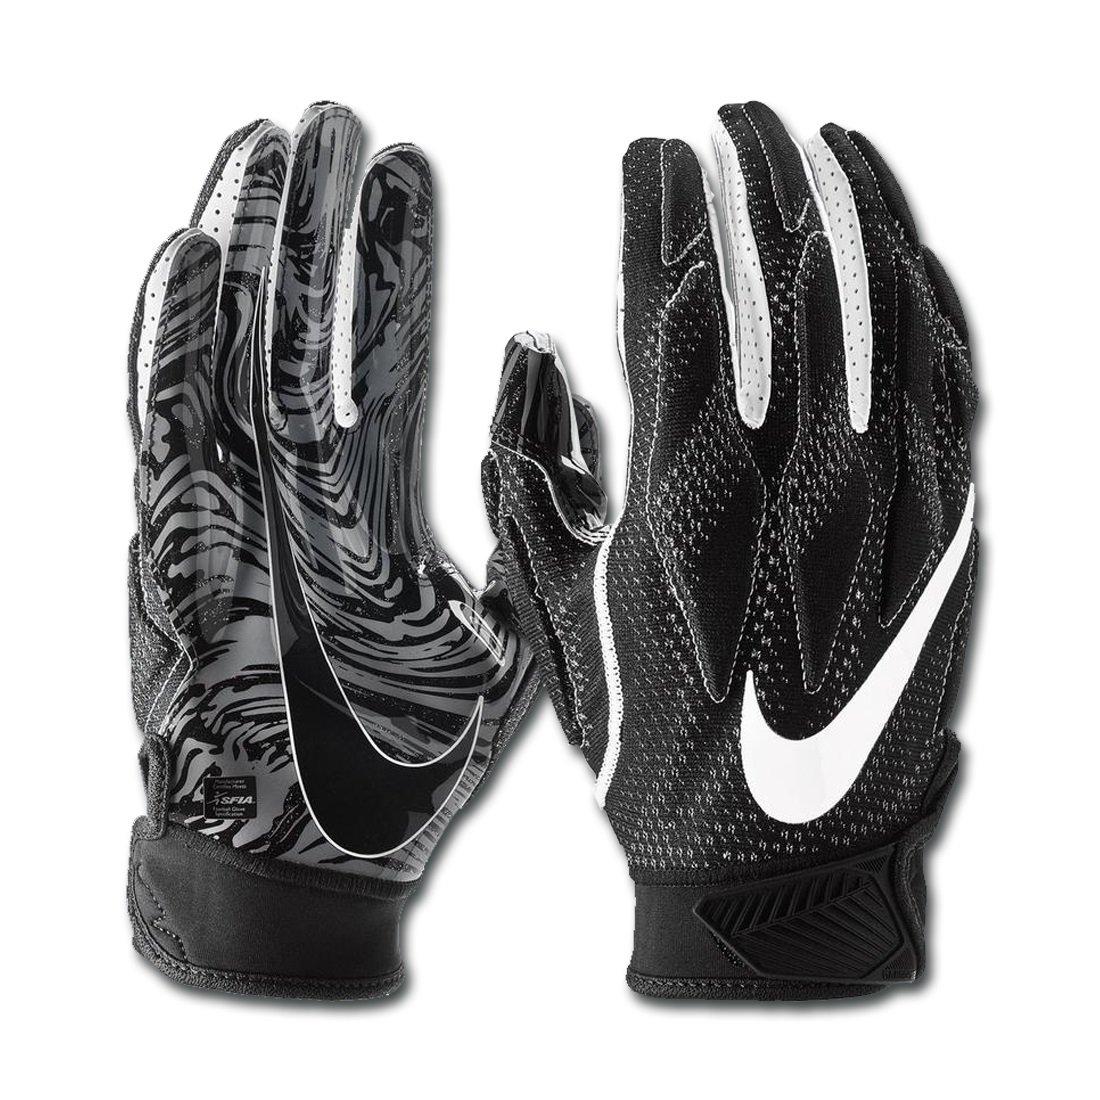 NIKE Men's Super Bad 4.5 Football Gloves (Black, XX-Large)